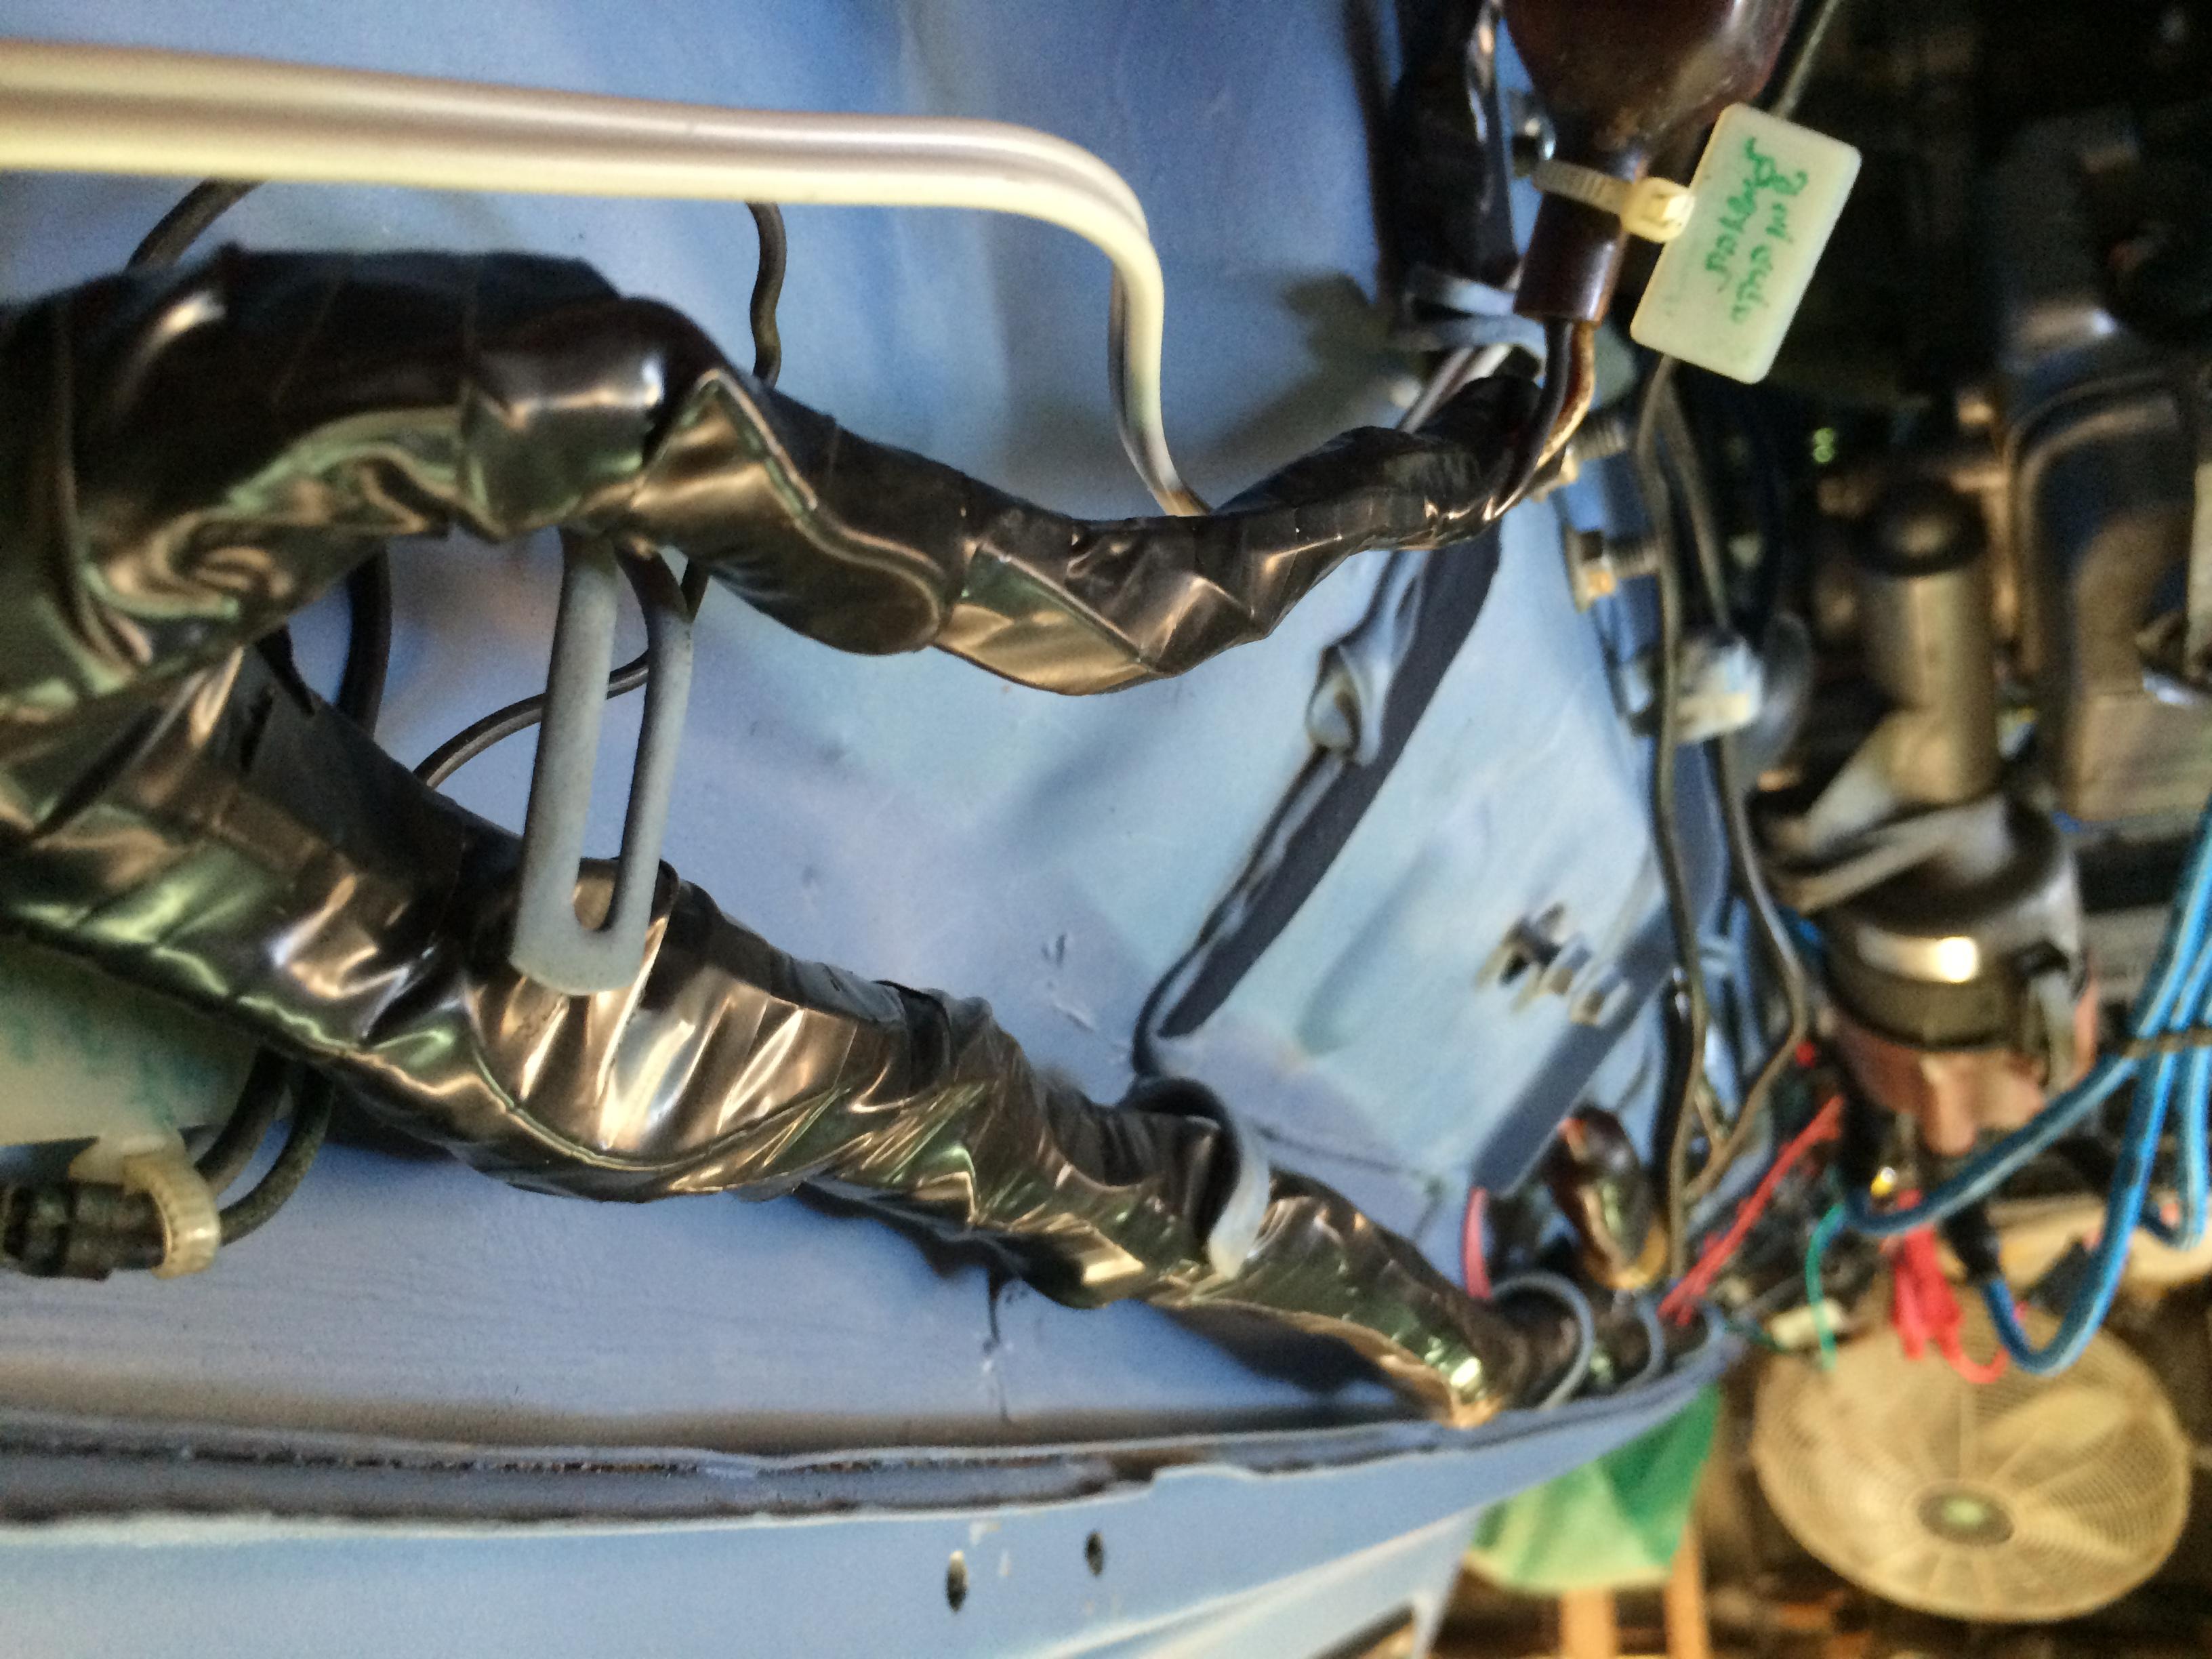 SJ410 Wires